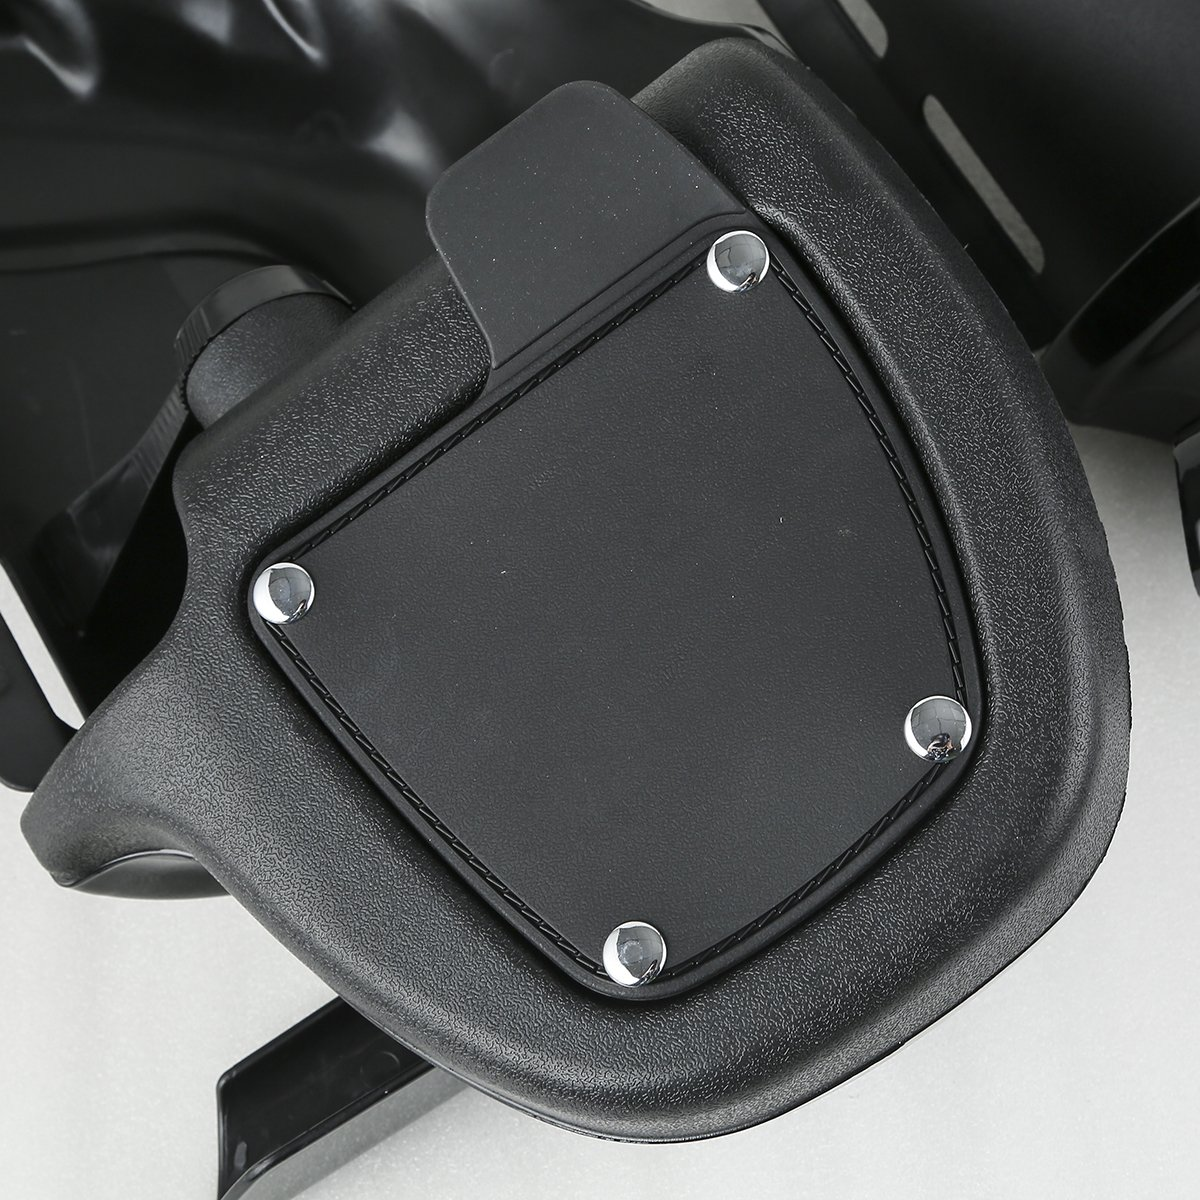 XMT-MOTO Black Lower Vented Leg Fairings Cap Glove Box For Harley-Davidson Touring Models 1983-2013 by XMT-MOTO (Image #5)